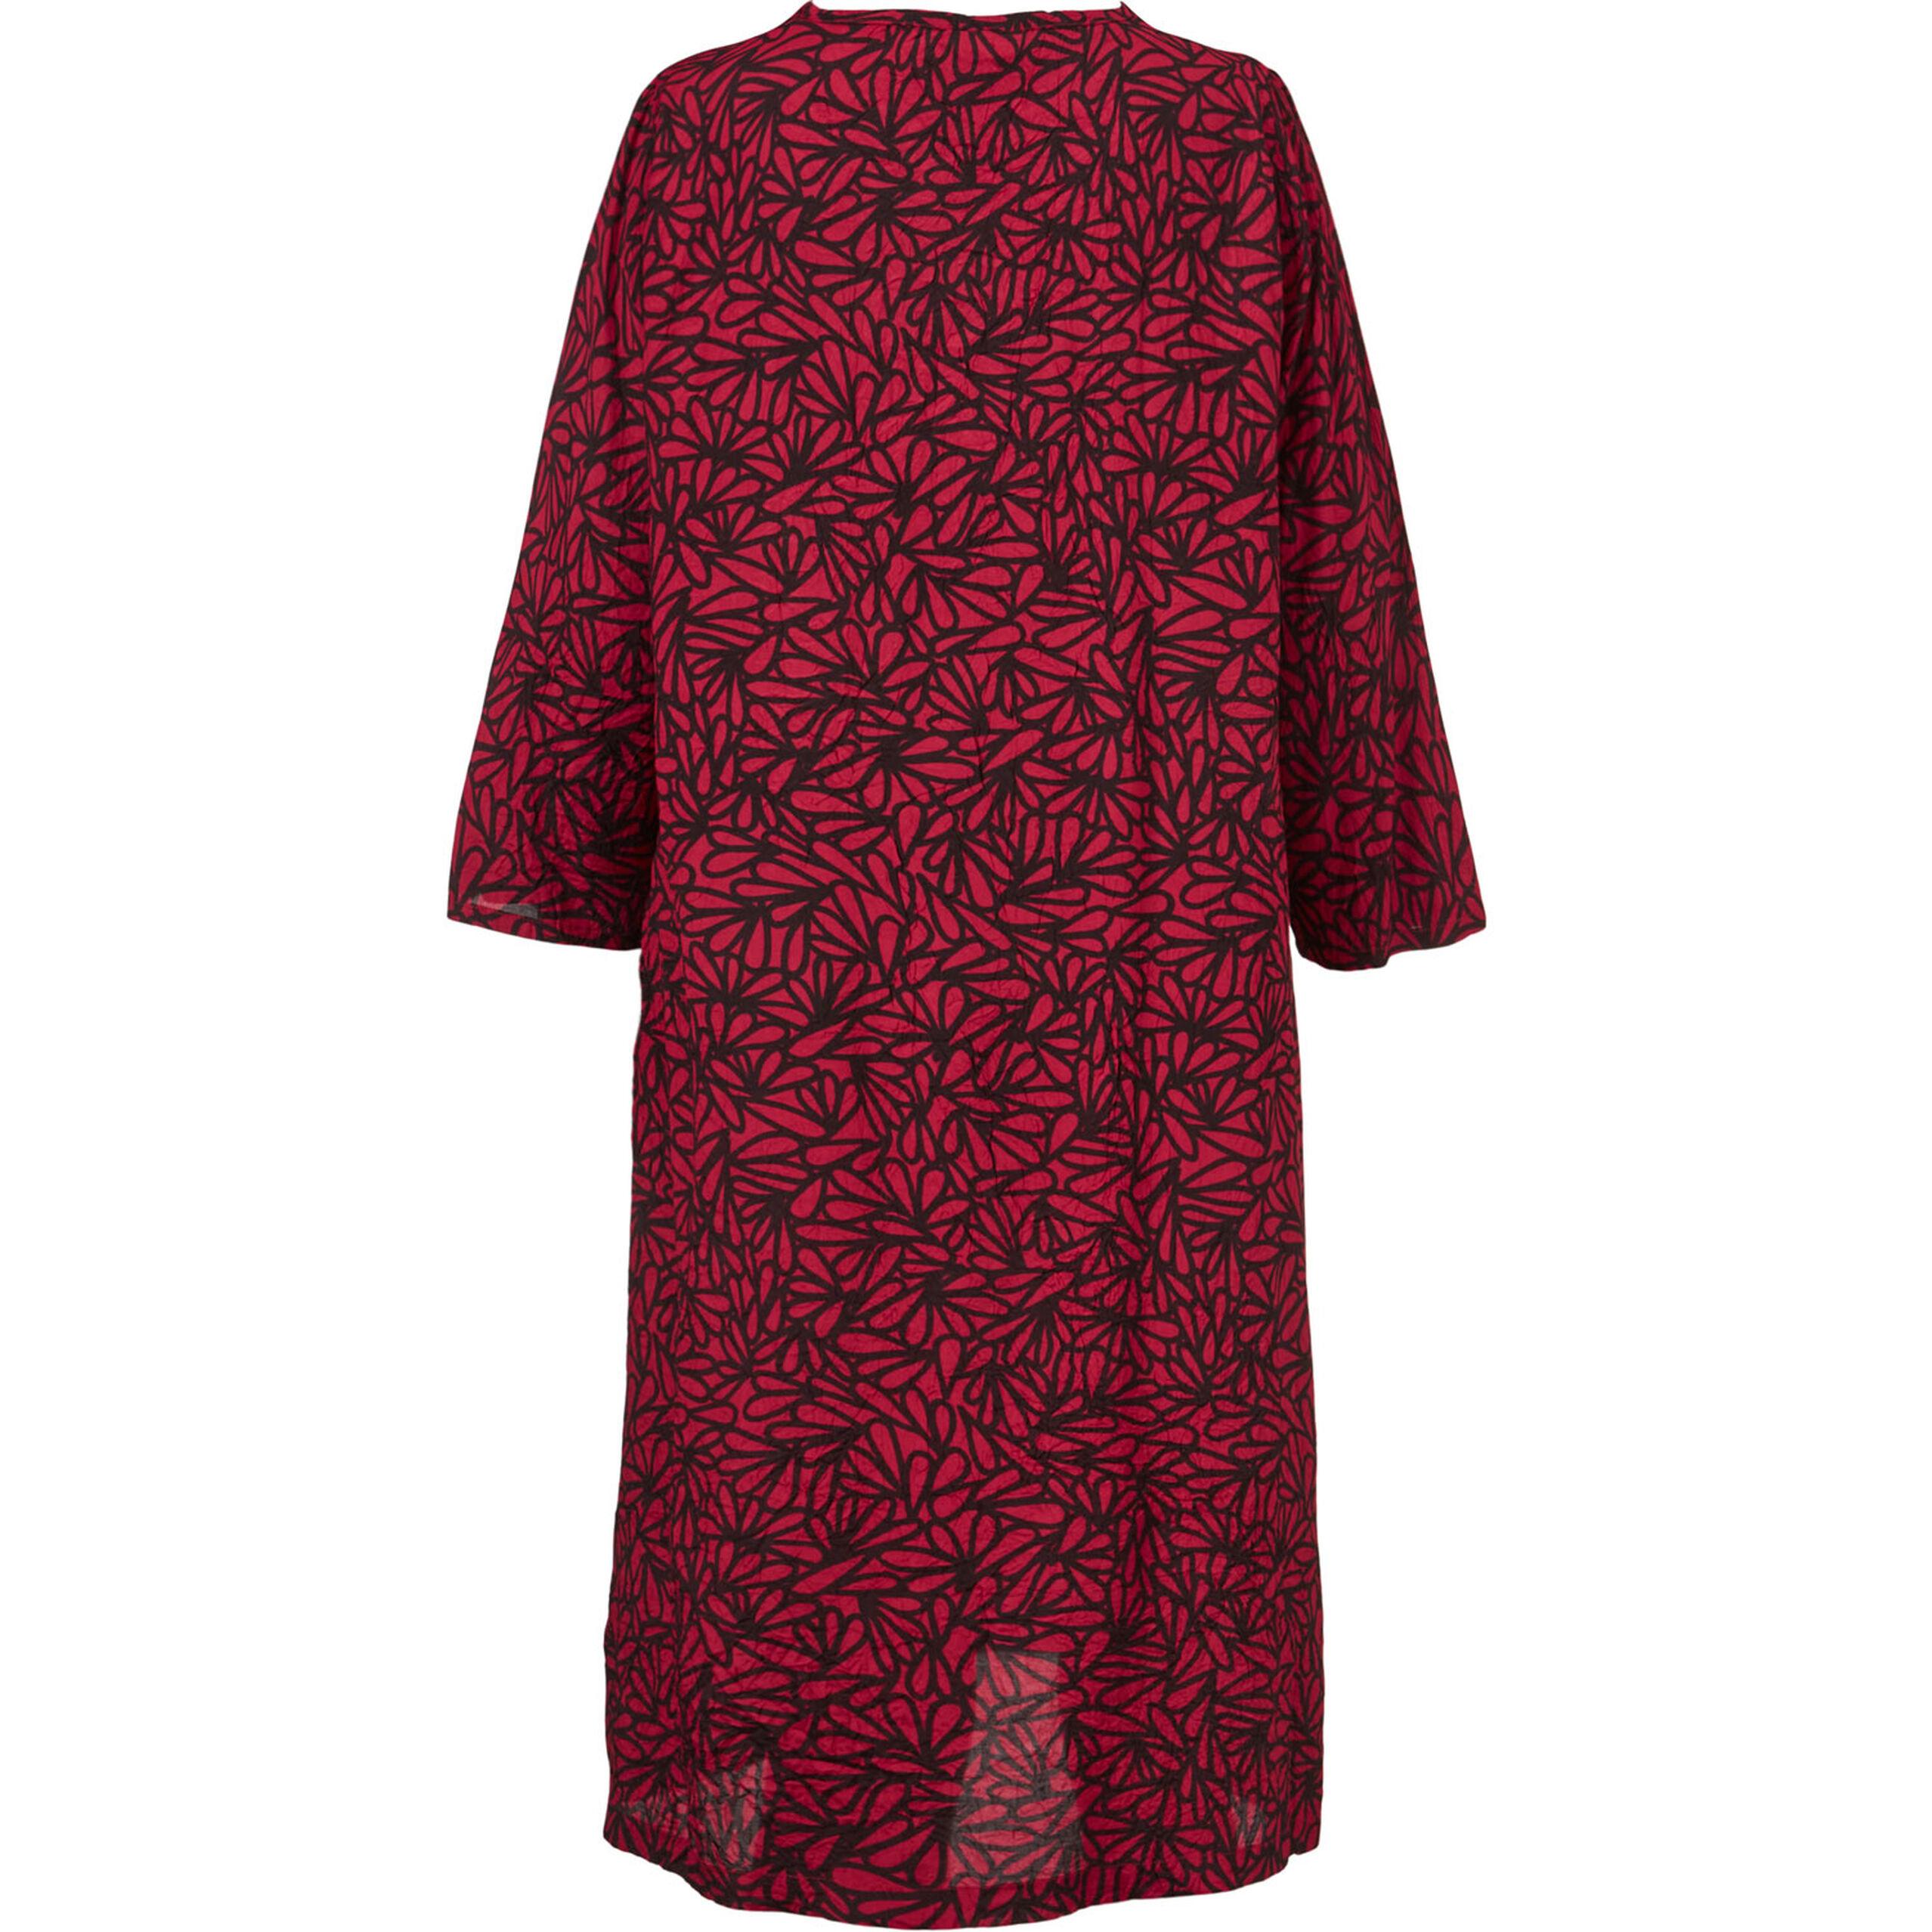 NONIE DRESS, Scarlet Sage, hi-res